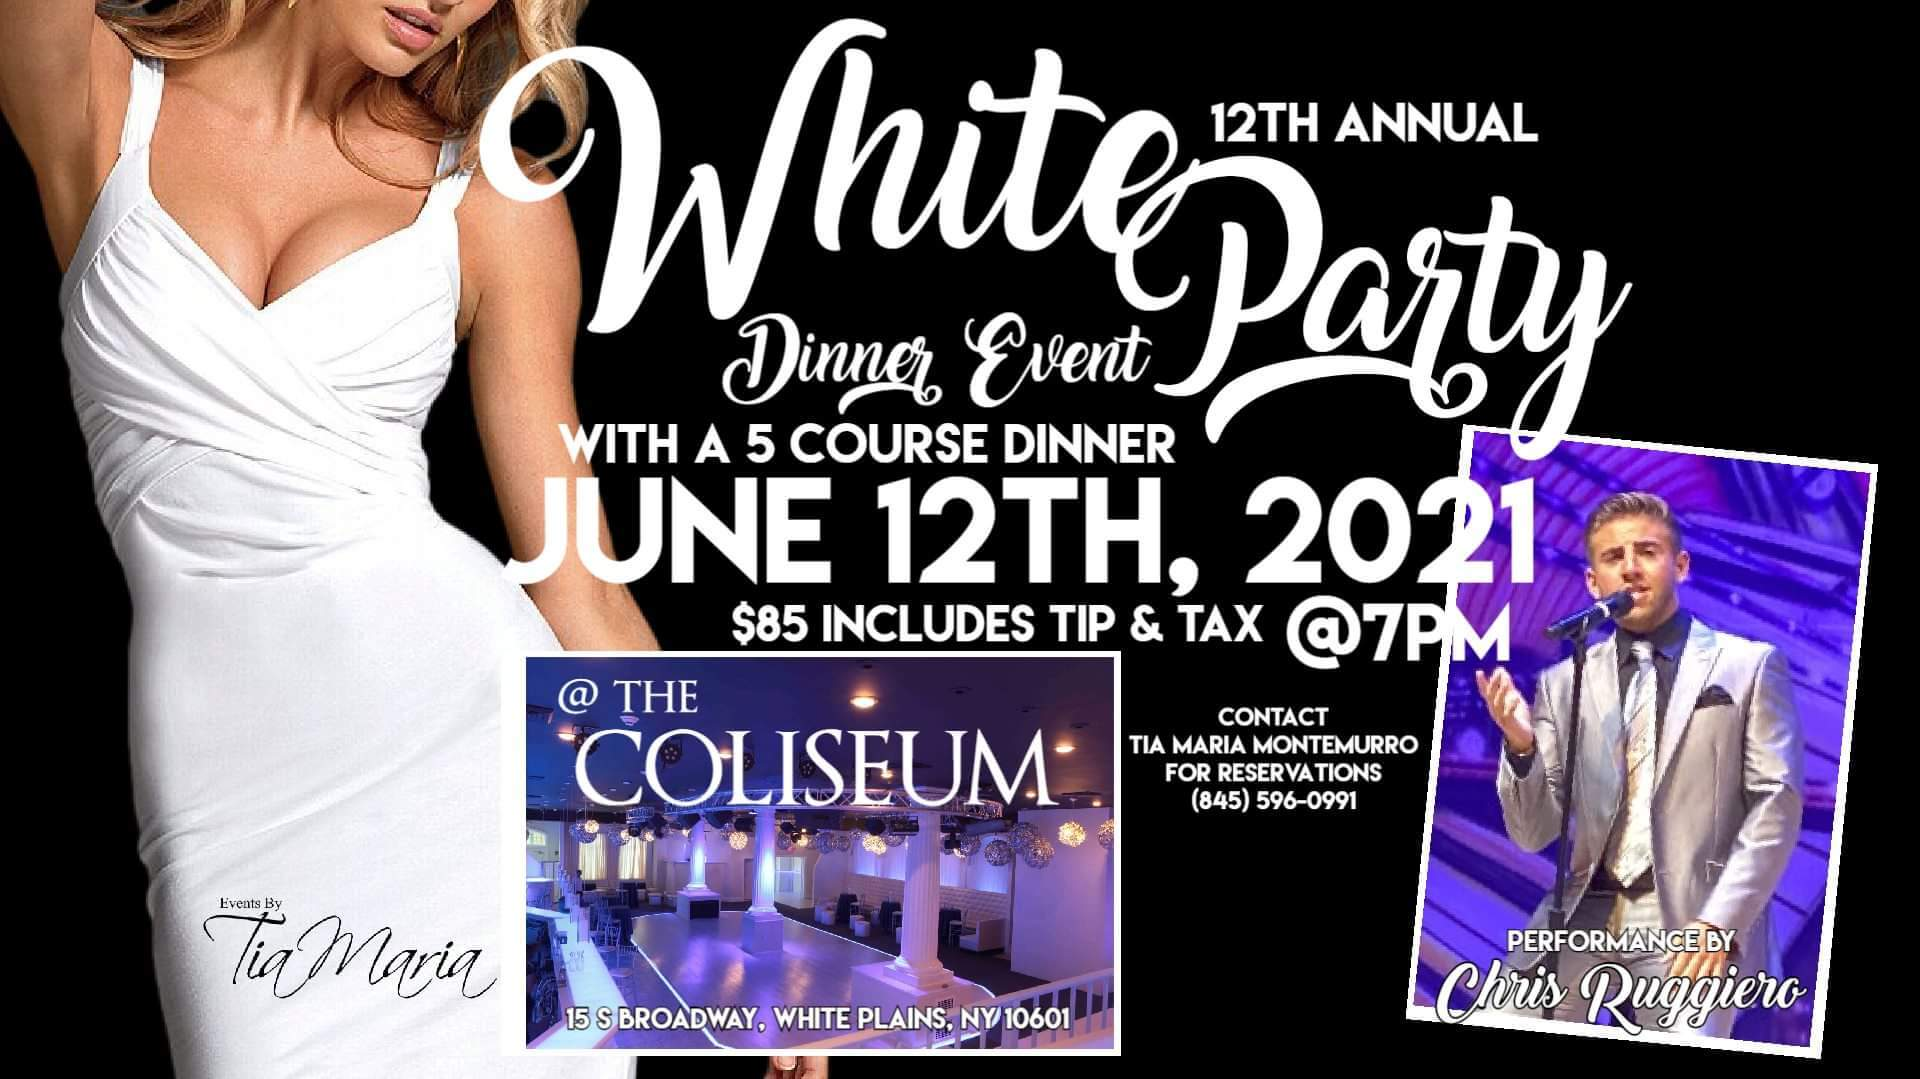 2021-06-12 Chris Ruggiero at the Coliseum White Party